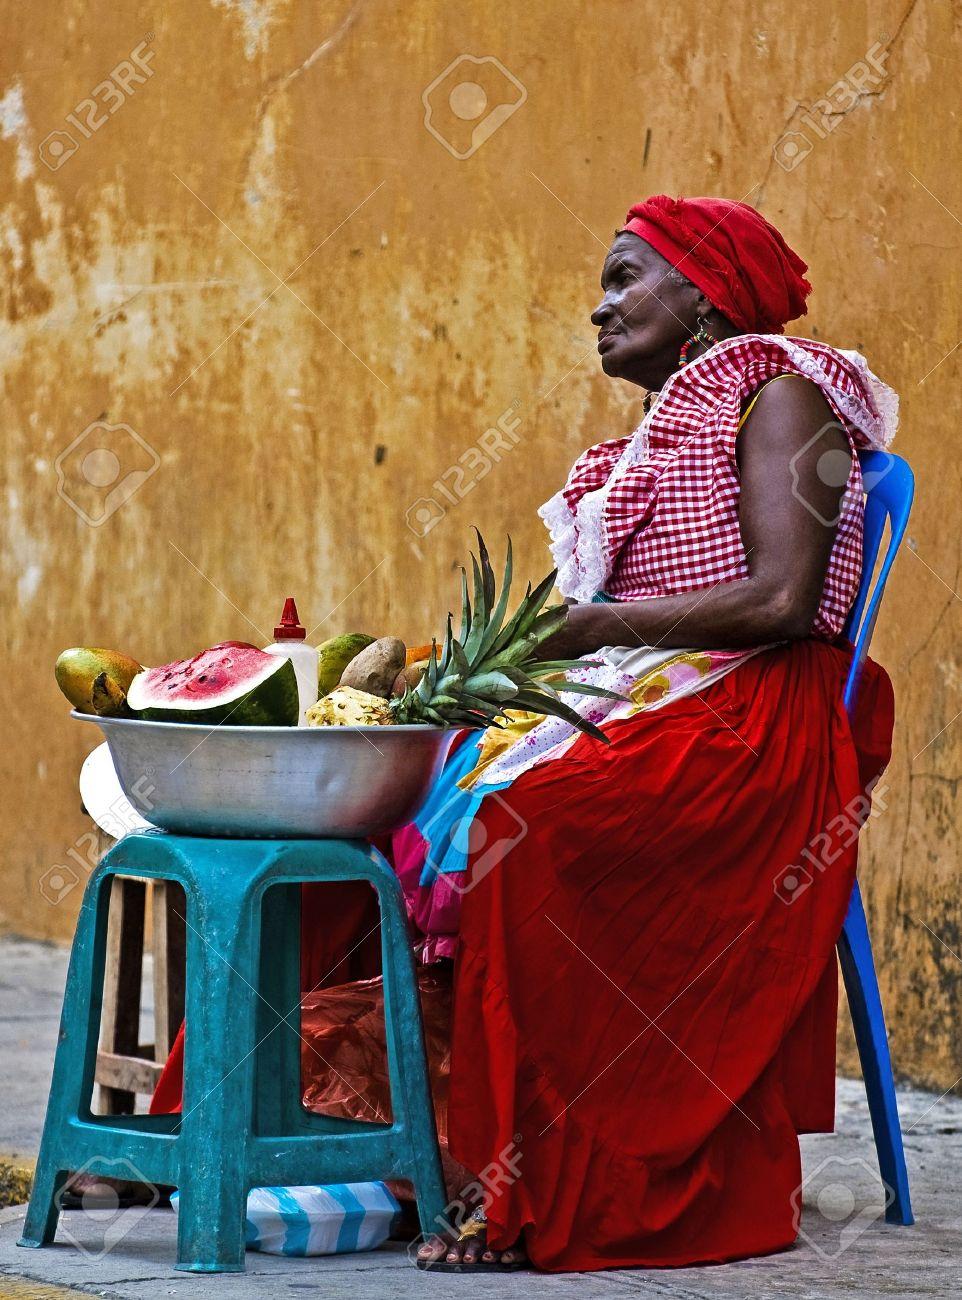 CARTAGENA DE INDIAS , COLOMBIA - DEC 21:Unidentified Palenquera woman sell fruts in Cartagena de Indias on December 21 2010,Palenqueras are a unique African descendat ethnic group found in the north region of South America - 11026008